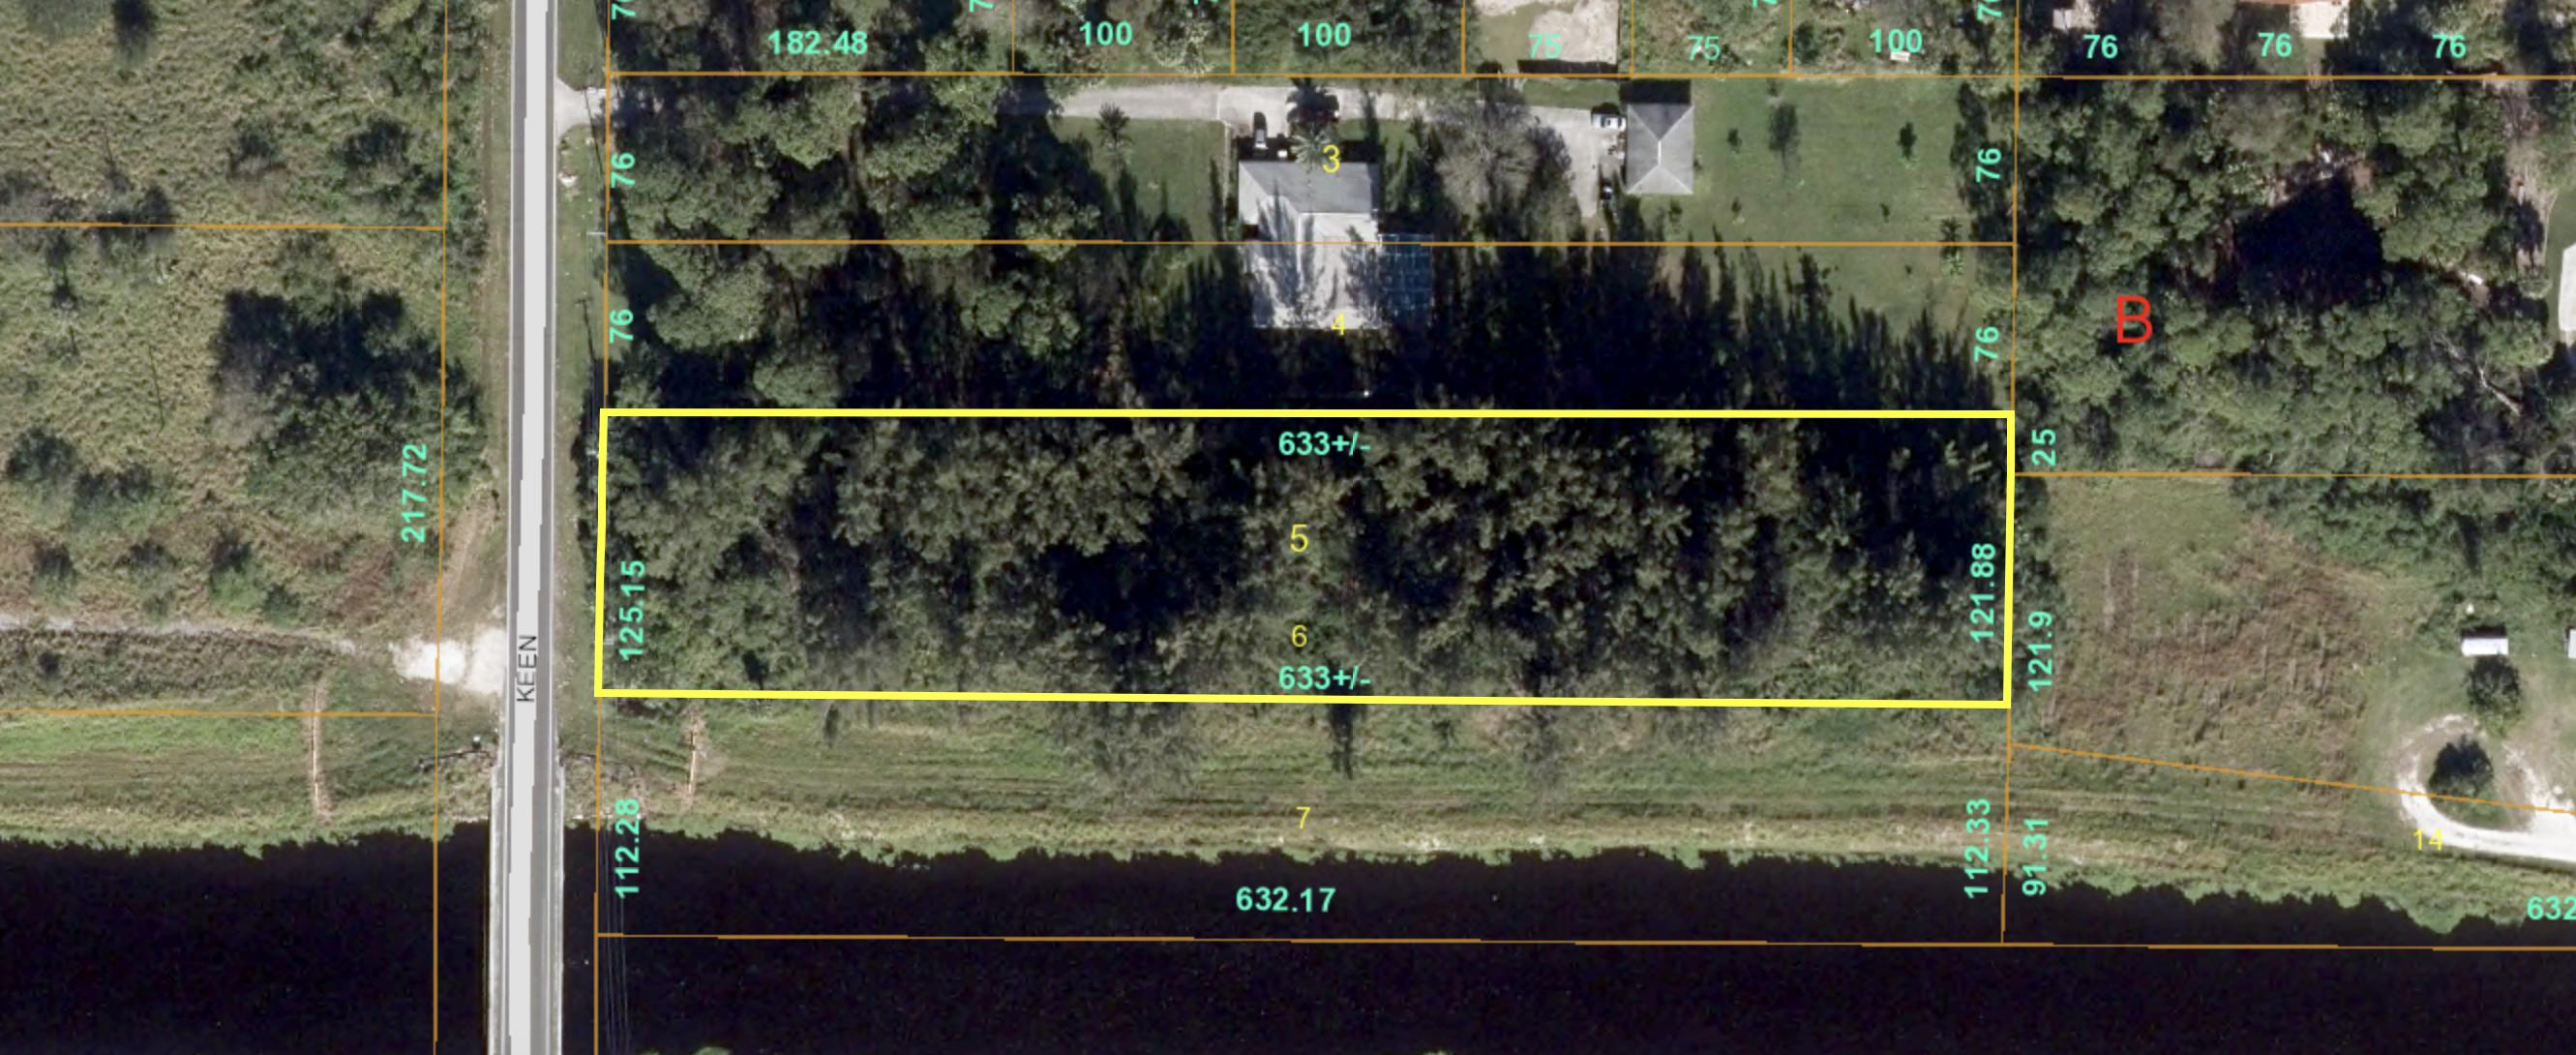 0 Keen Road, Fort Pierce, Florida 34946, ,C,Single family,Keen,RX-10623679